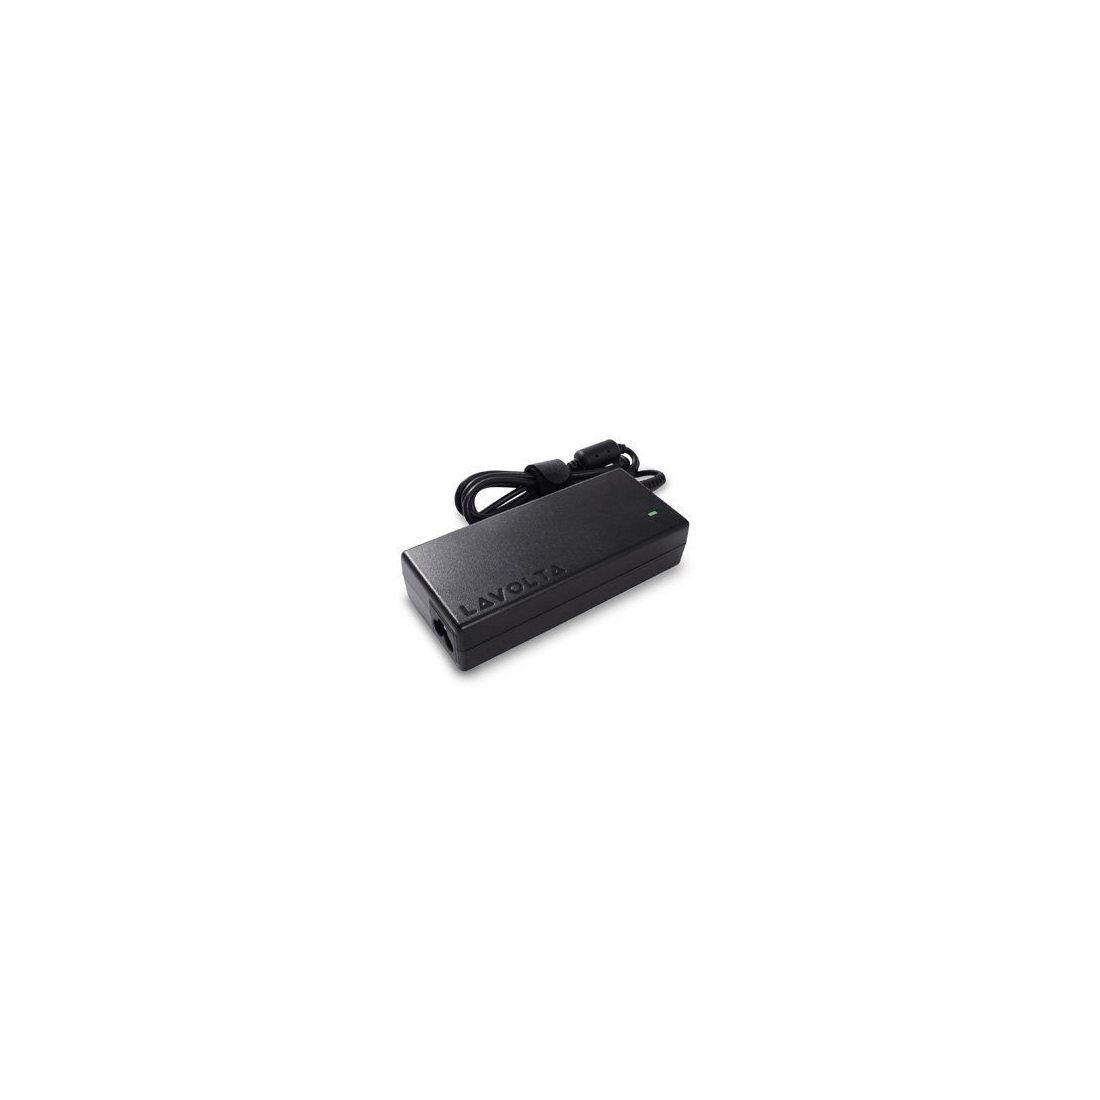 40W Chargeur pour Samsung NP-N110 NP-N120 NP-N130 NP-N140 NP-N150 NP-N210 NP-N220 NP-N310 NP-N510 NP-NB30 Notebook Adaptor -